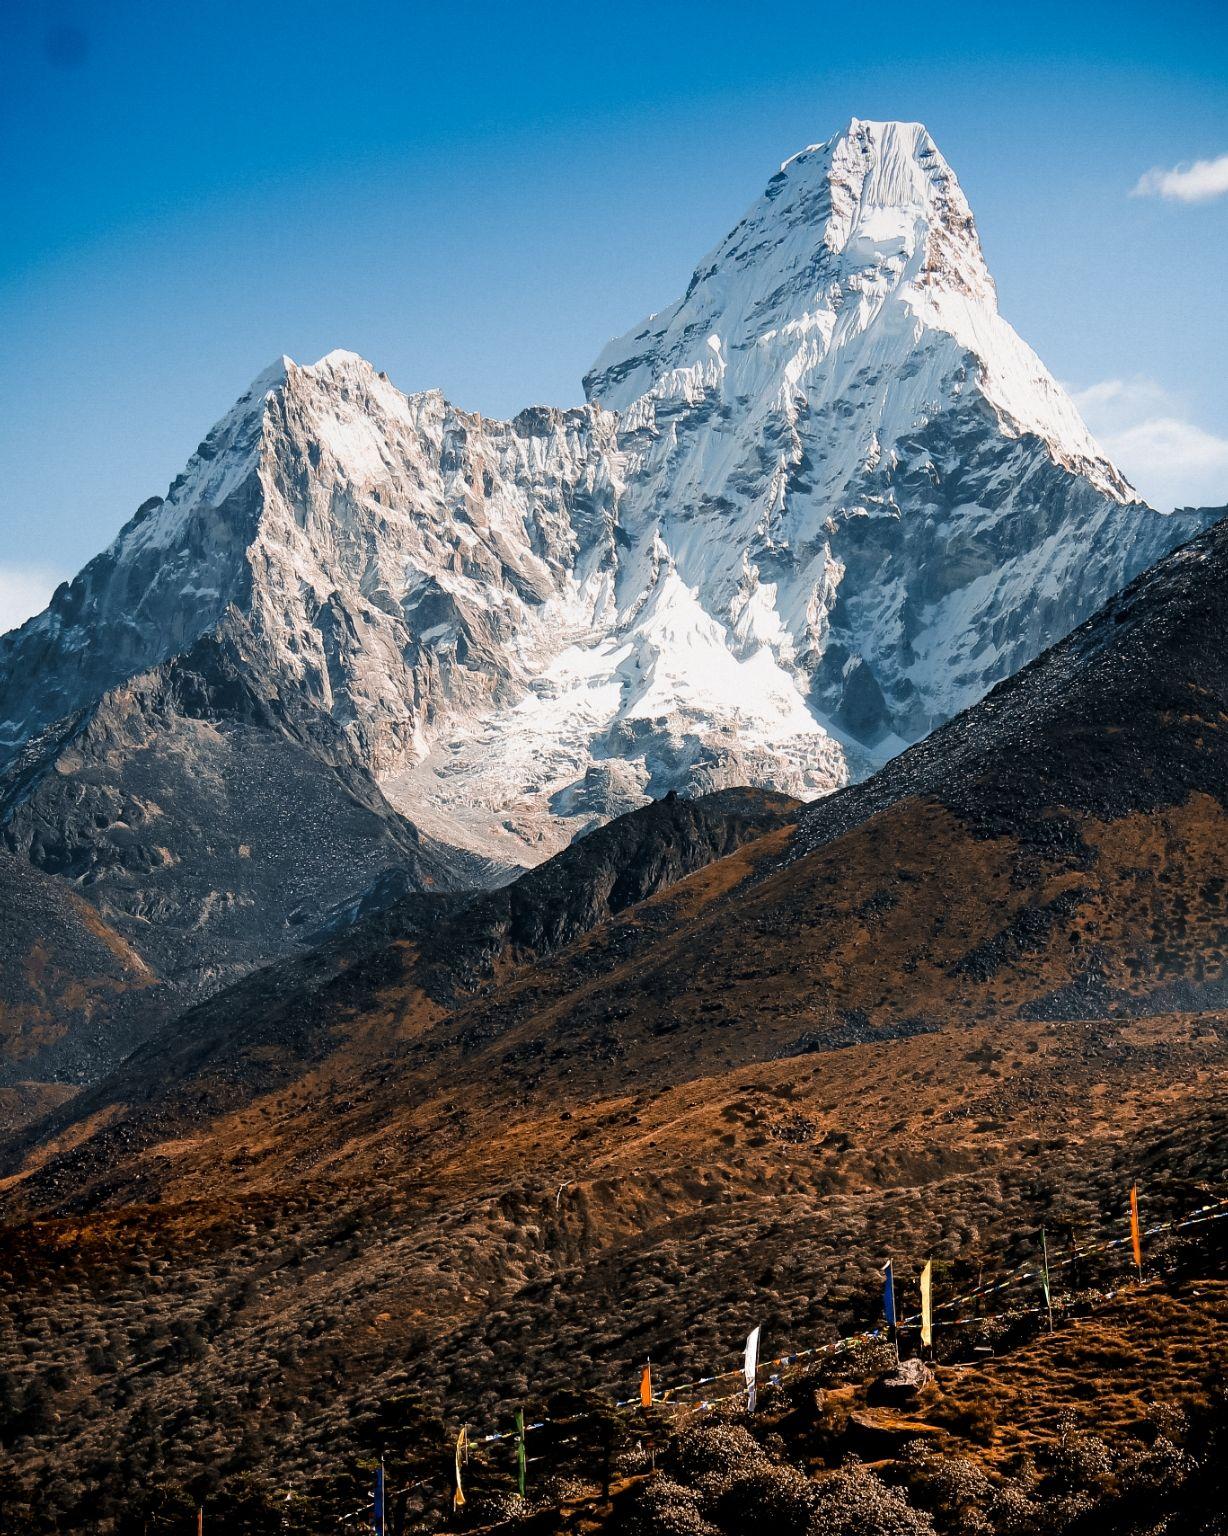 Photo of Everest Base Camp Trekking Route By Tanmaya Varshney